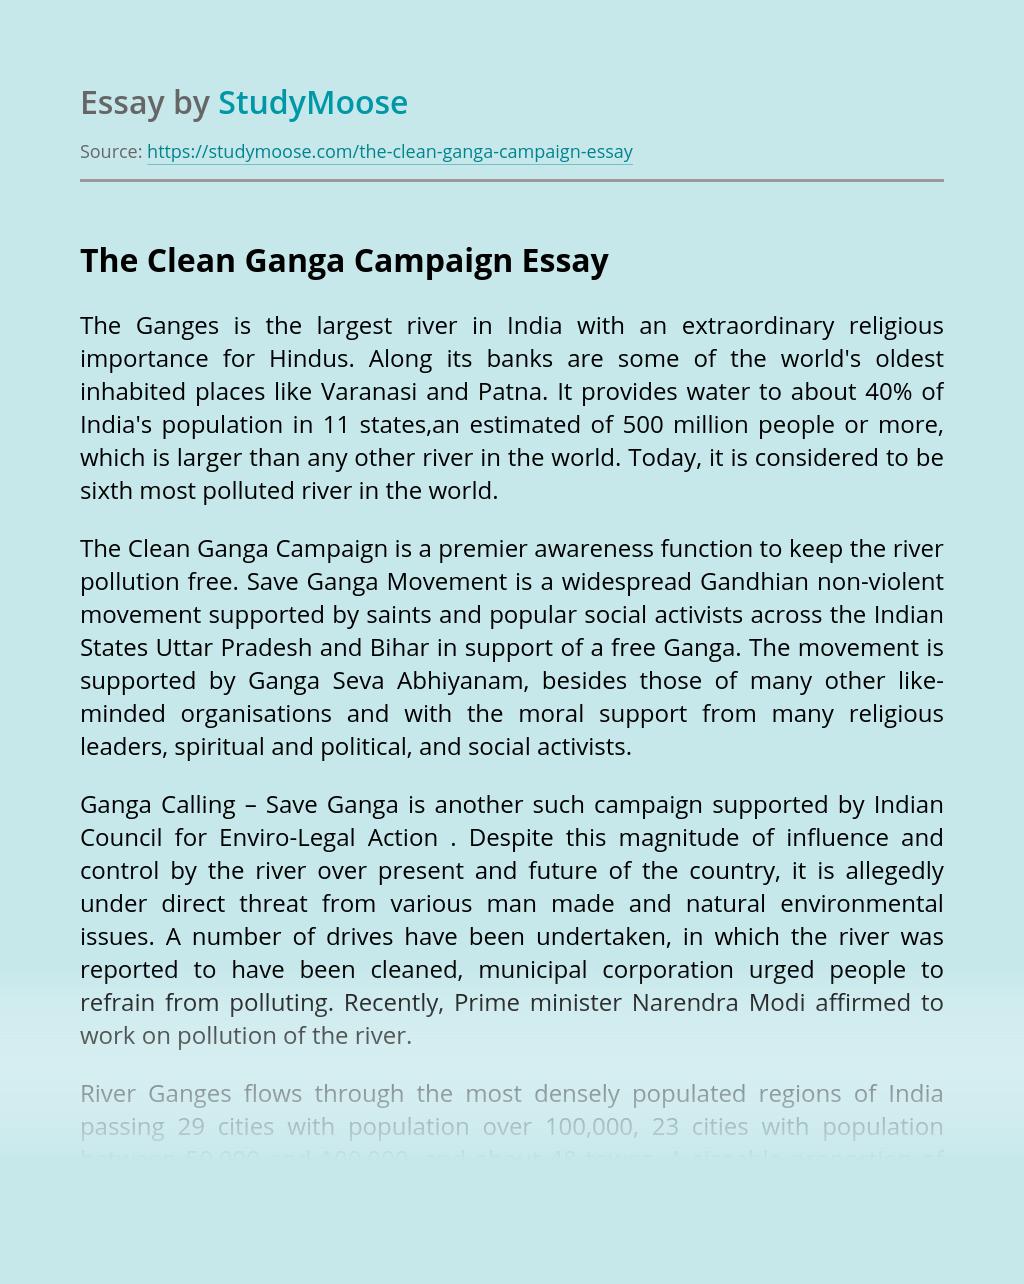 The Clean Ganga Campaign